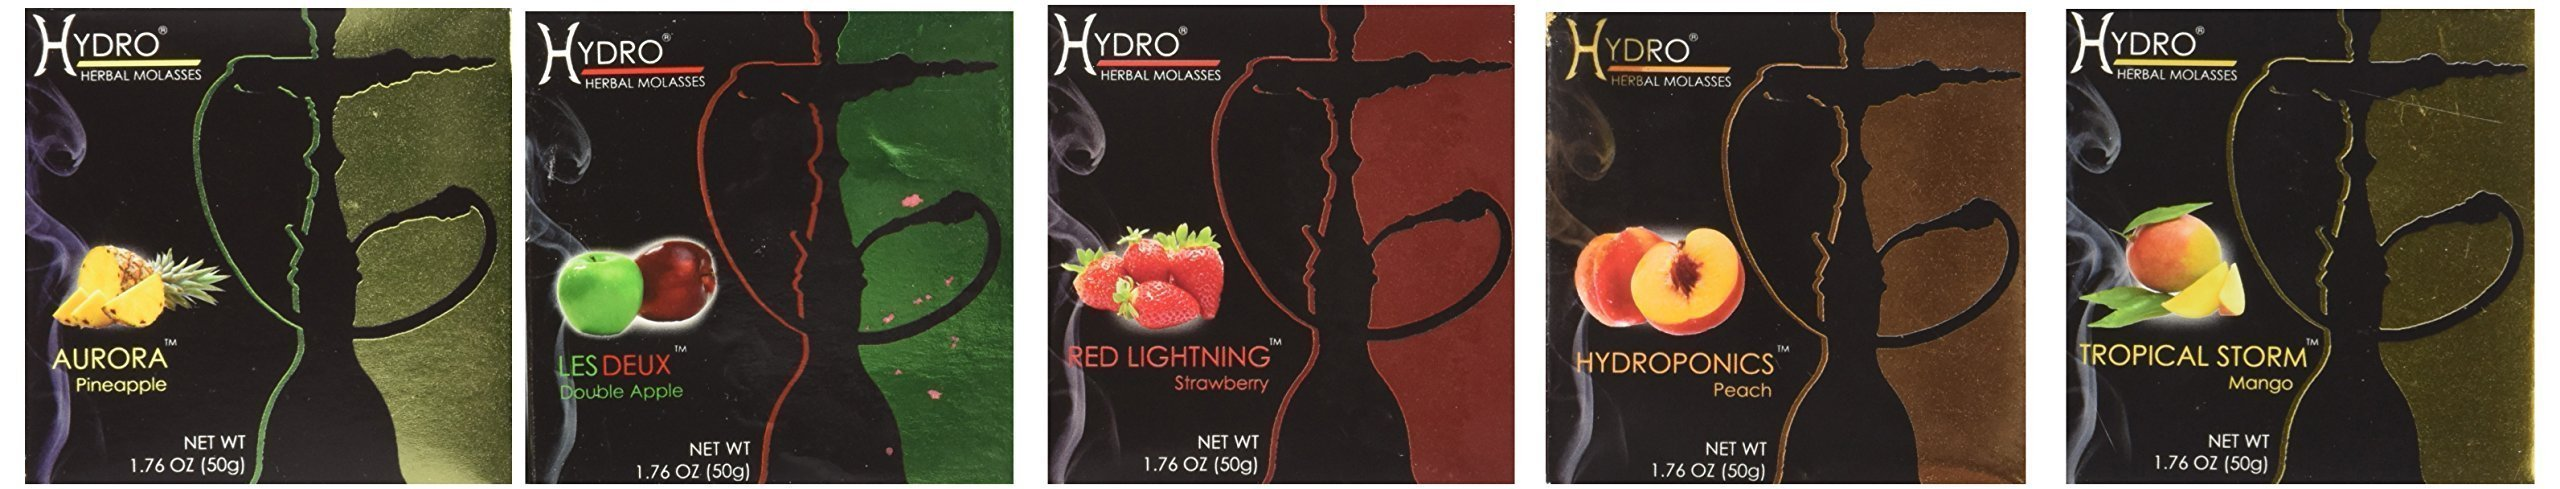 Hydro Herbal 250g, 5 Mix: Apple, Strawberry, Mango, Peach & Pineapple, Hookah Shisha Tobacco Free Molasses